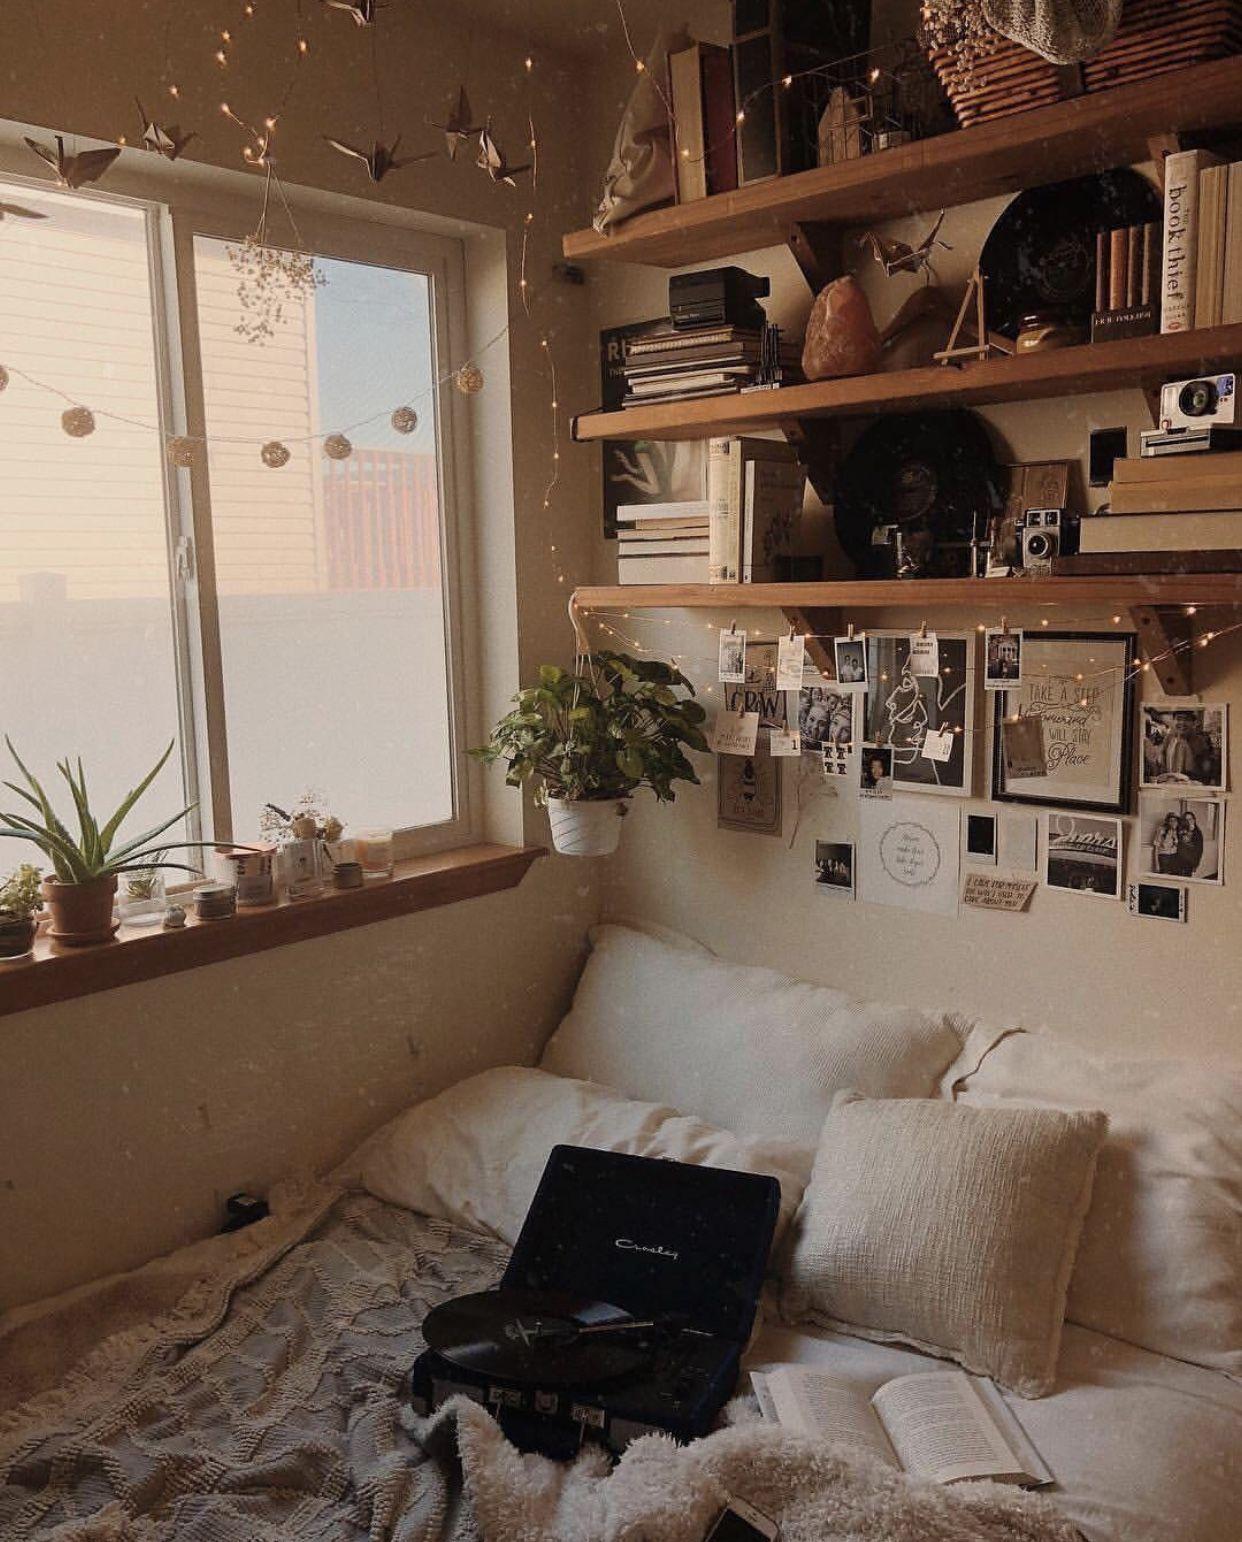 Pin by dominika walkowska on room ideas and inspiration for Decorazioni stanza